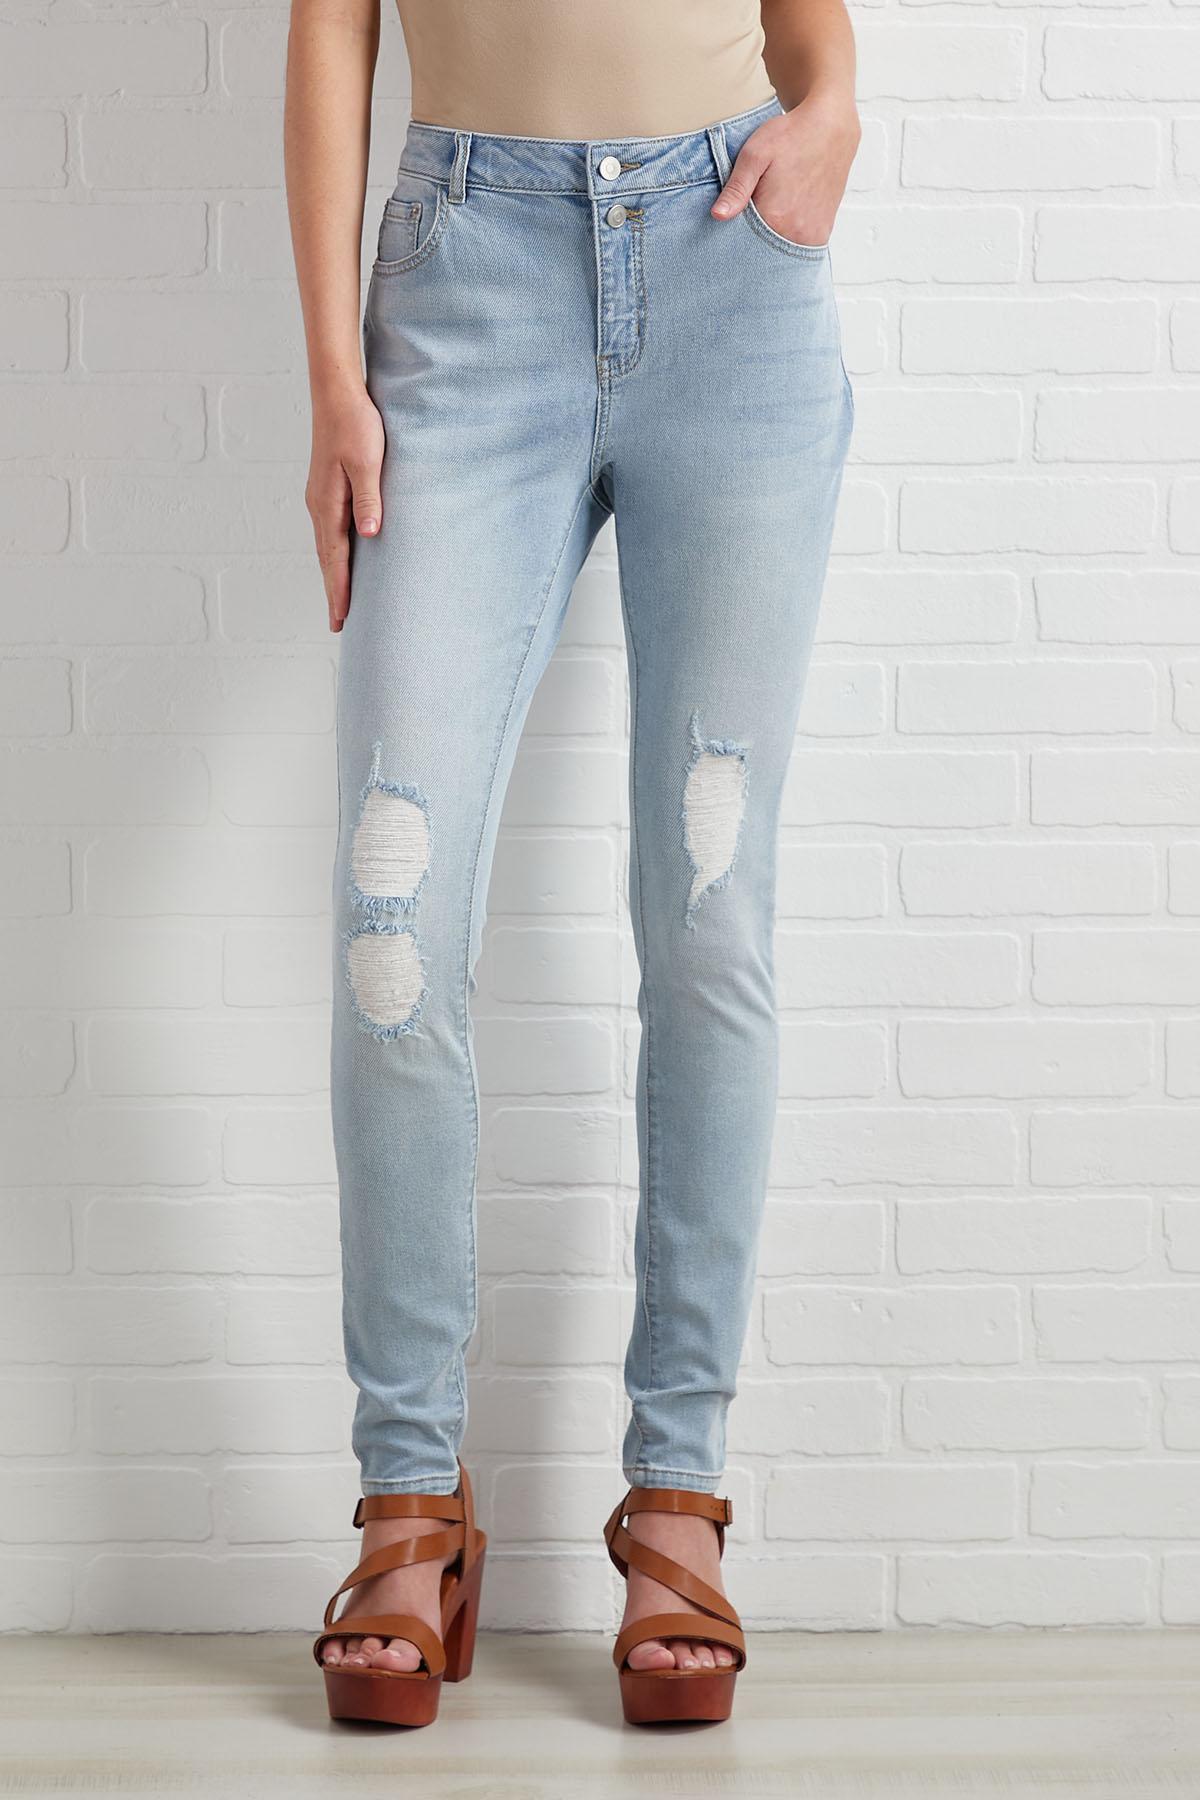 Follow The Light Jeans